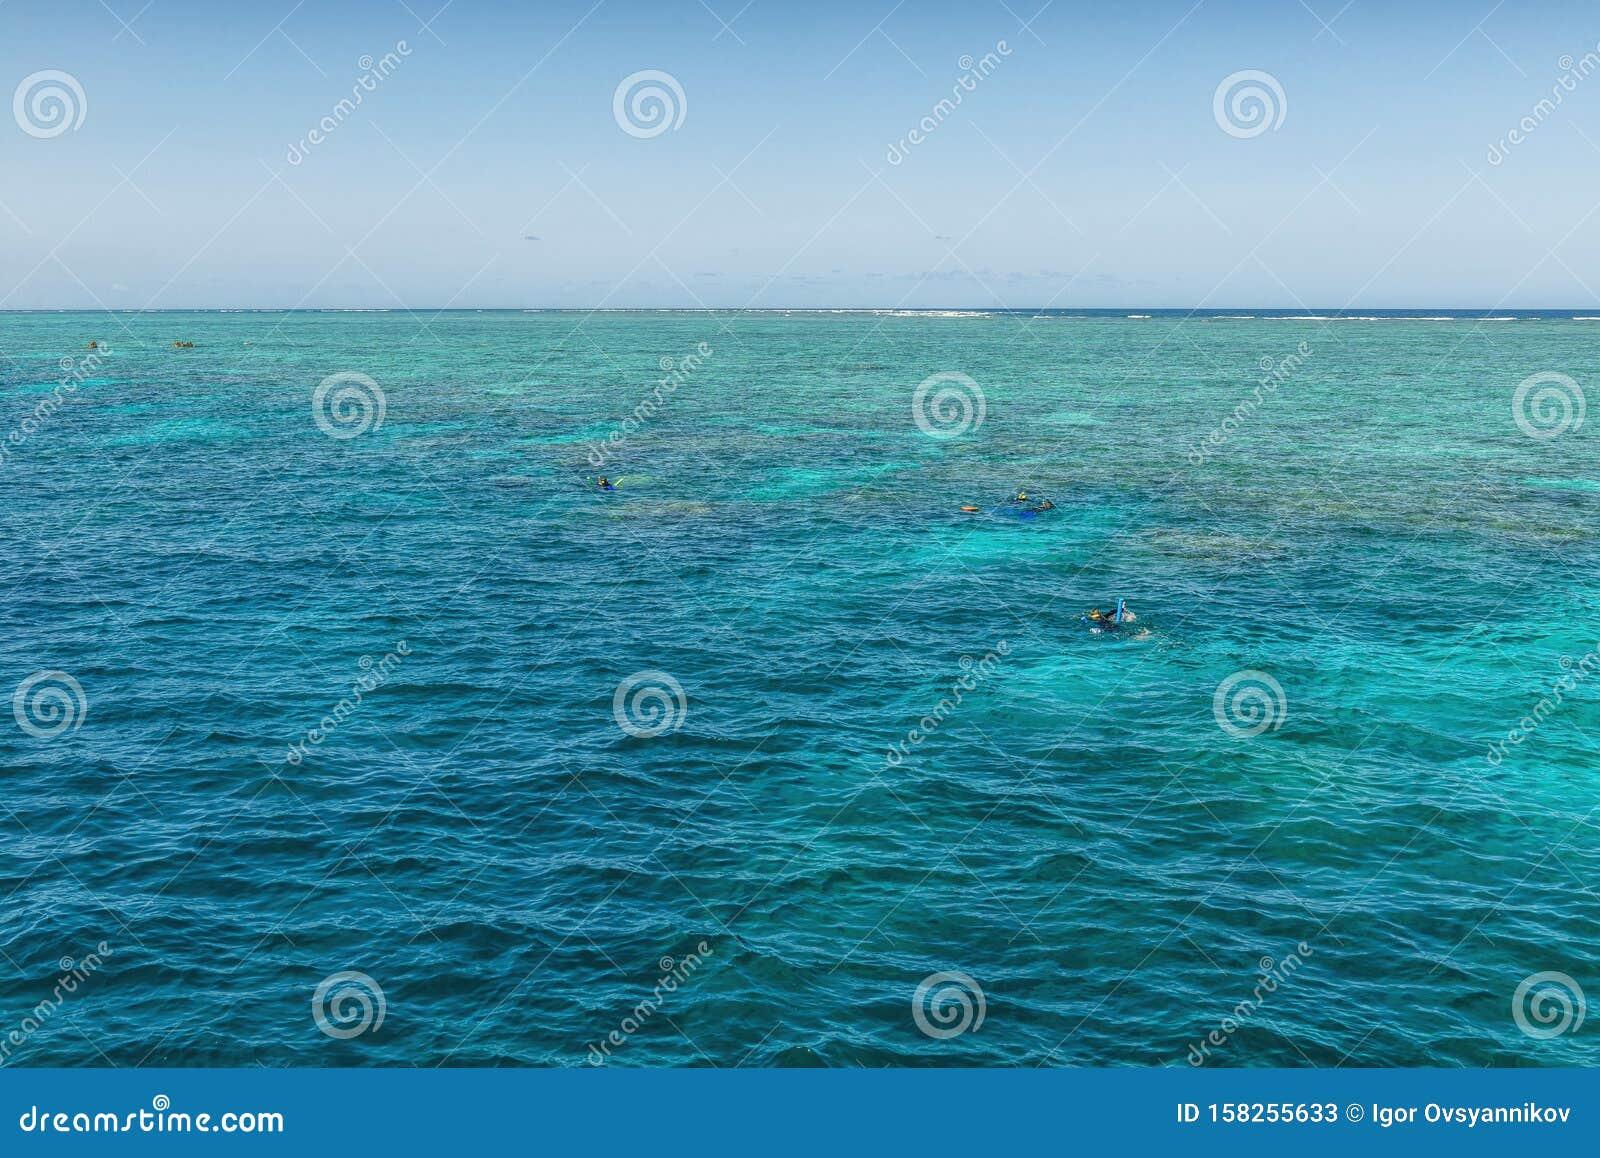 Winter sunny day on the Great Barrier Reef, Queensland, Port Douglas, Australia